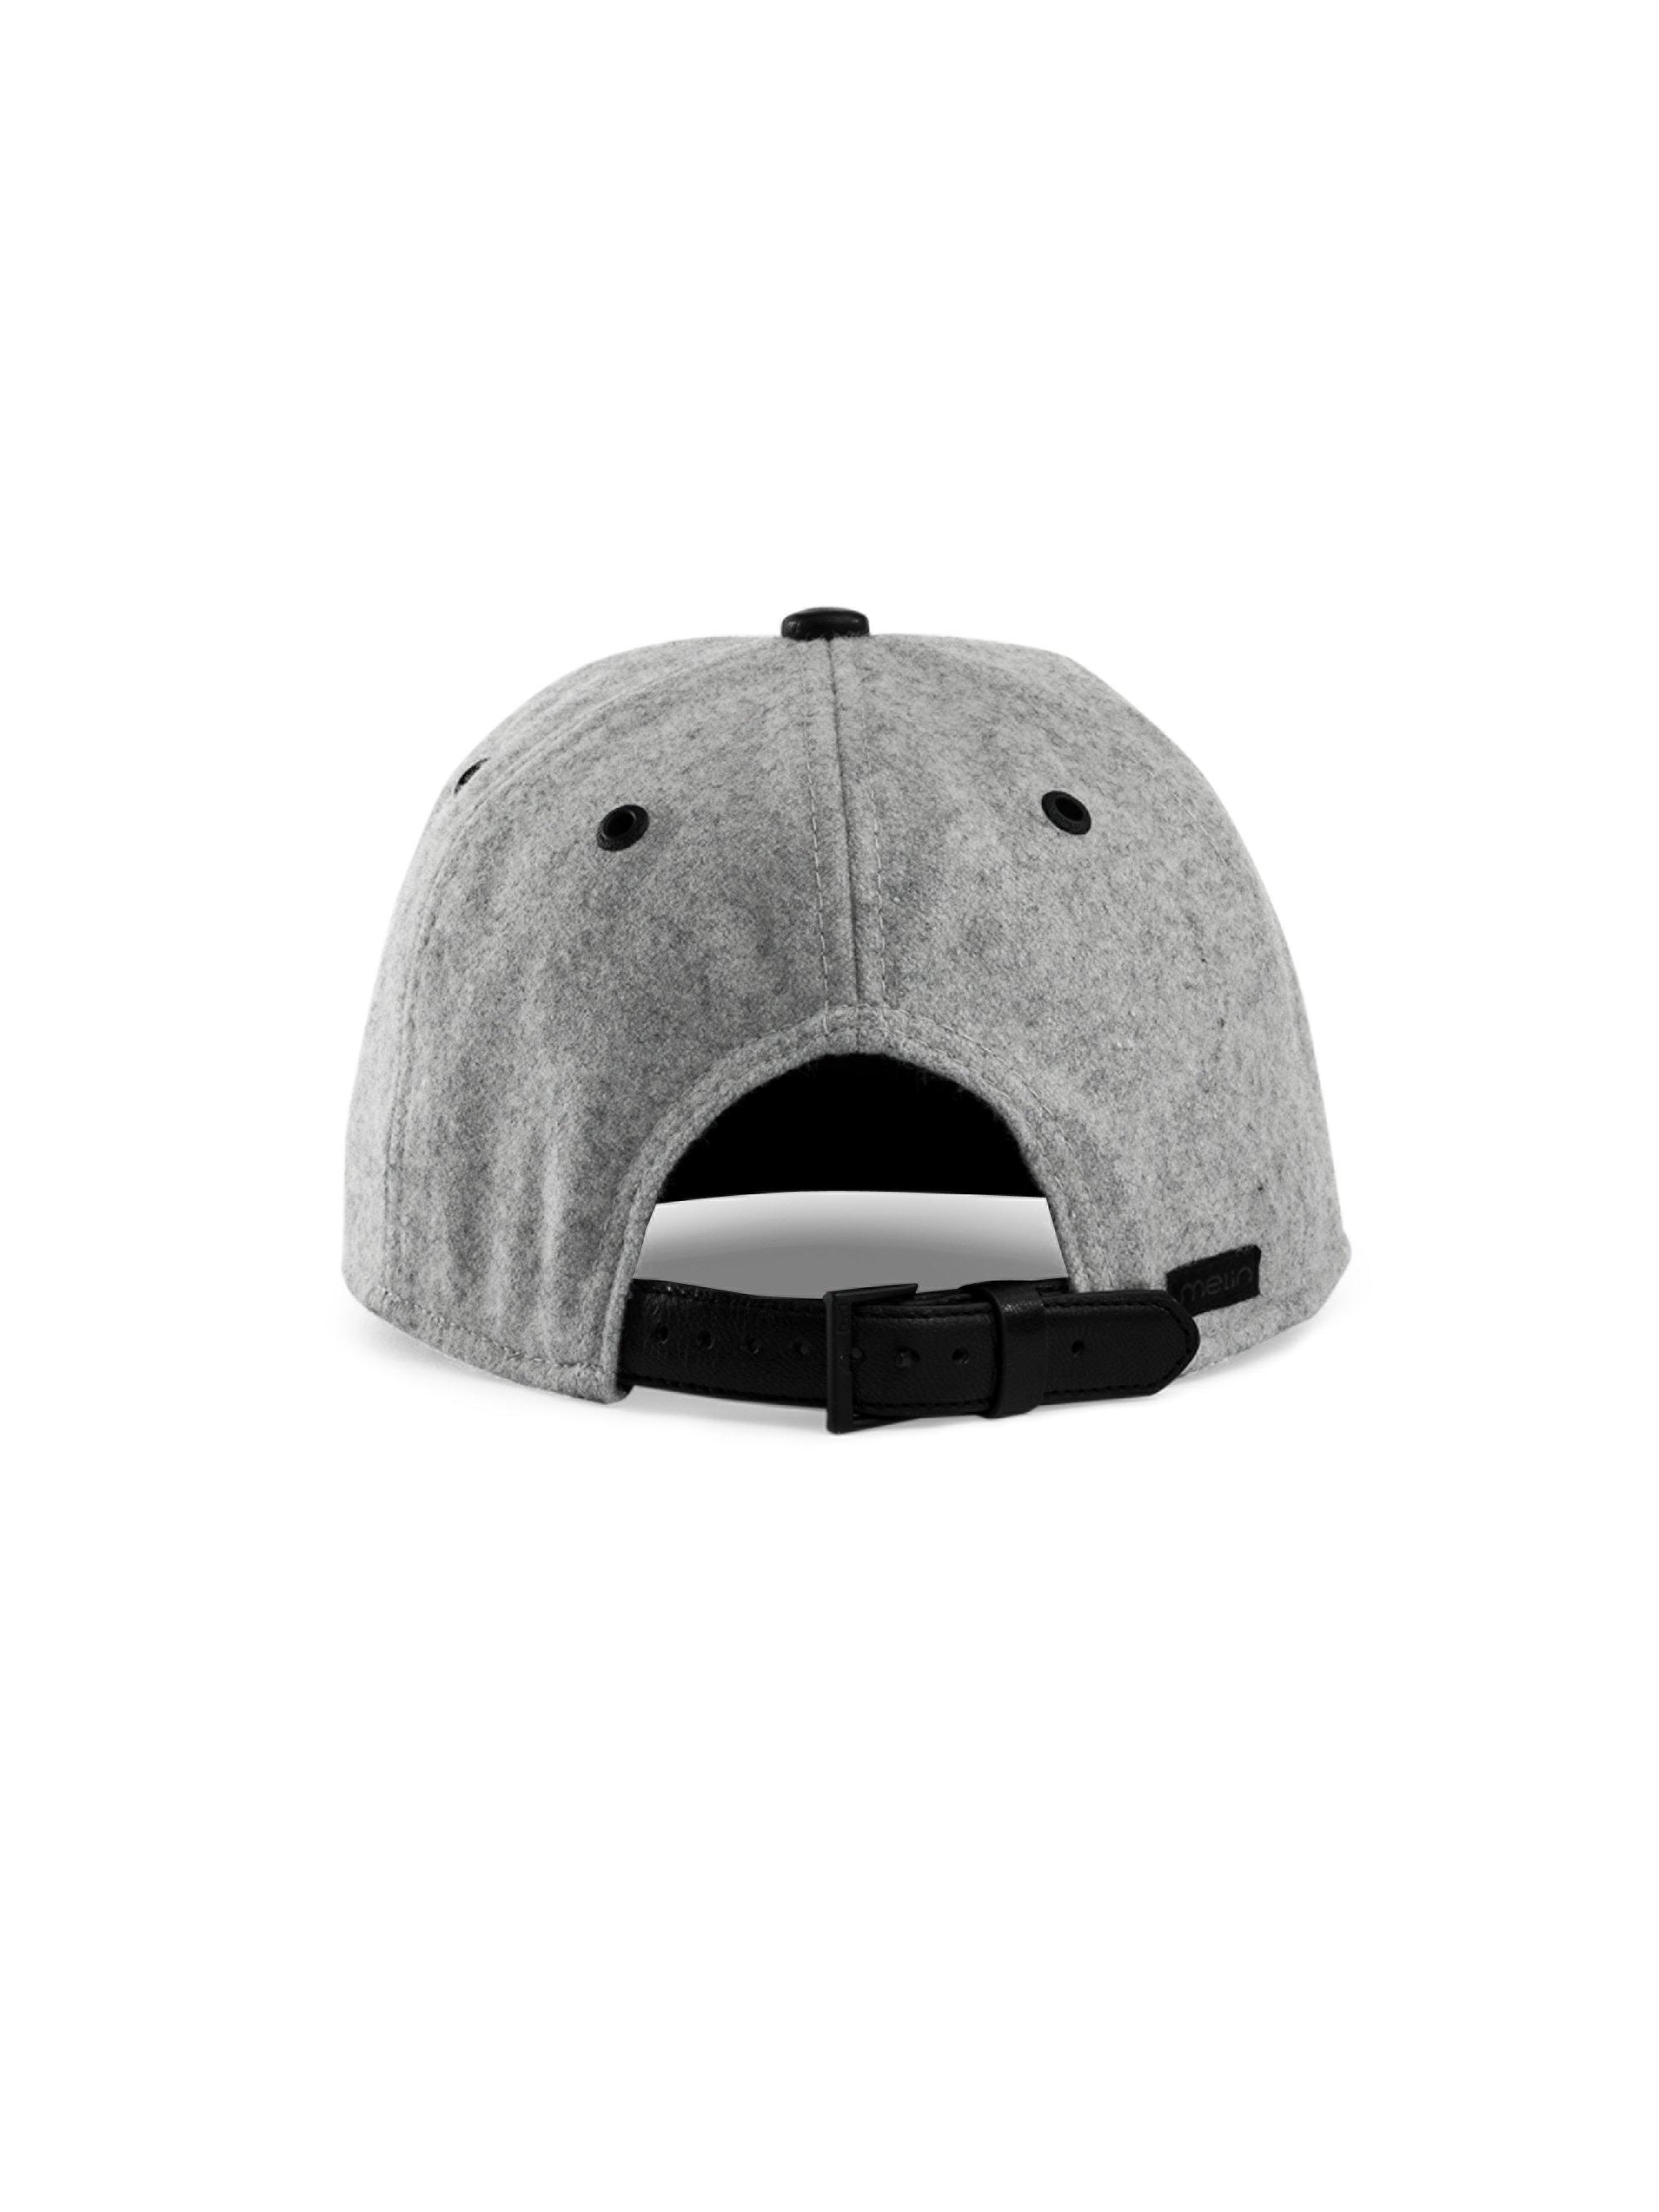 new arrivals 95a8a 1aa0b ... sale melin mini bar deluxe cap in gray for men lyst 4781b 27b26